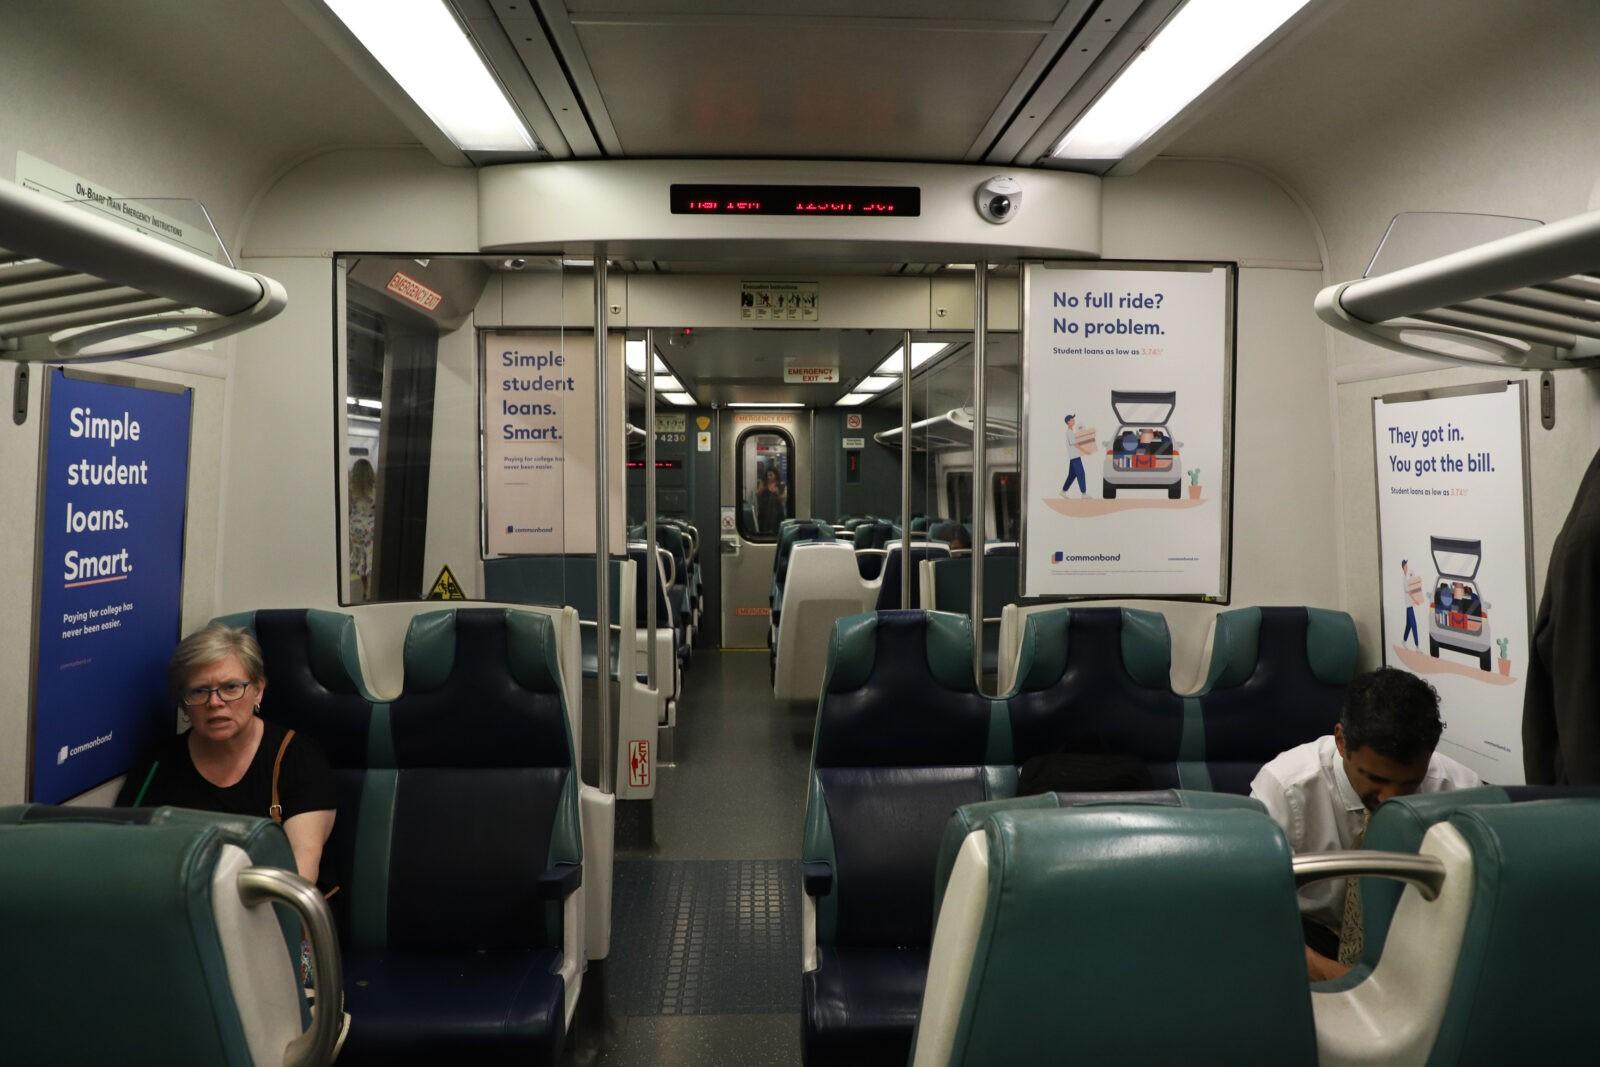 Metro-North-Interior-Brand-Train-Advertising-Common-Bond